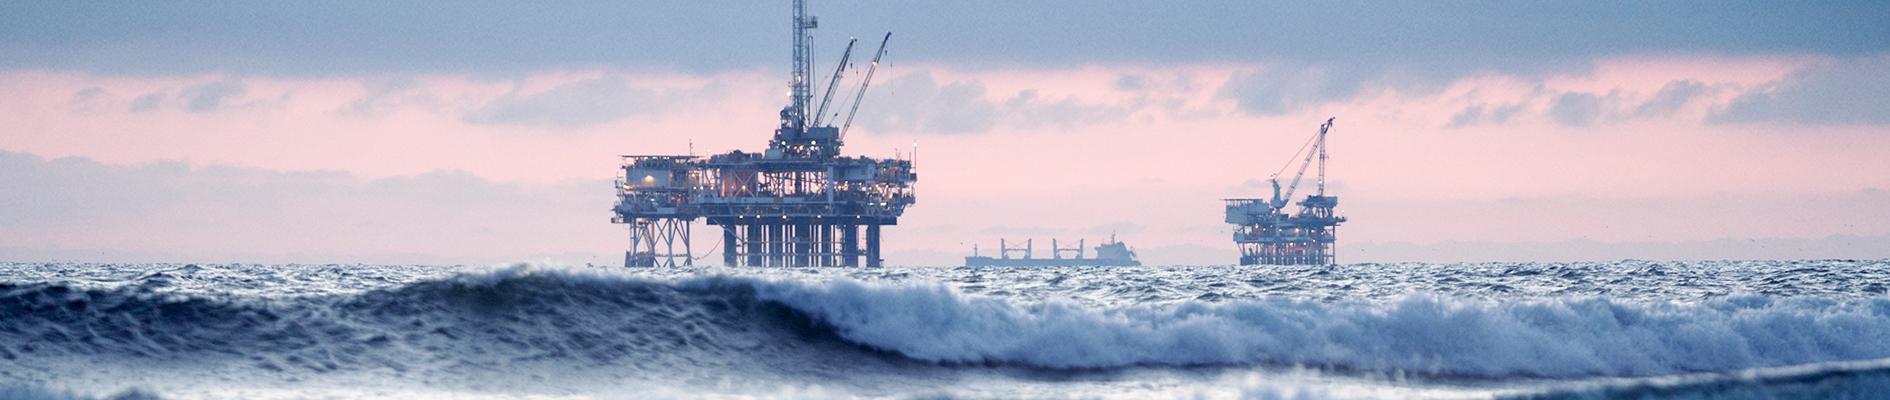 Outokumpu oil and gas